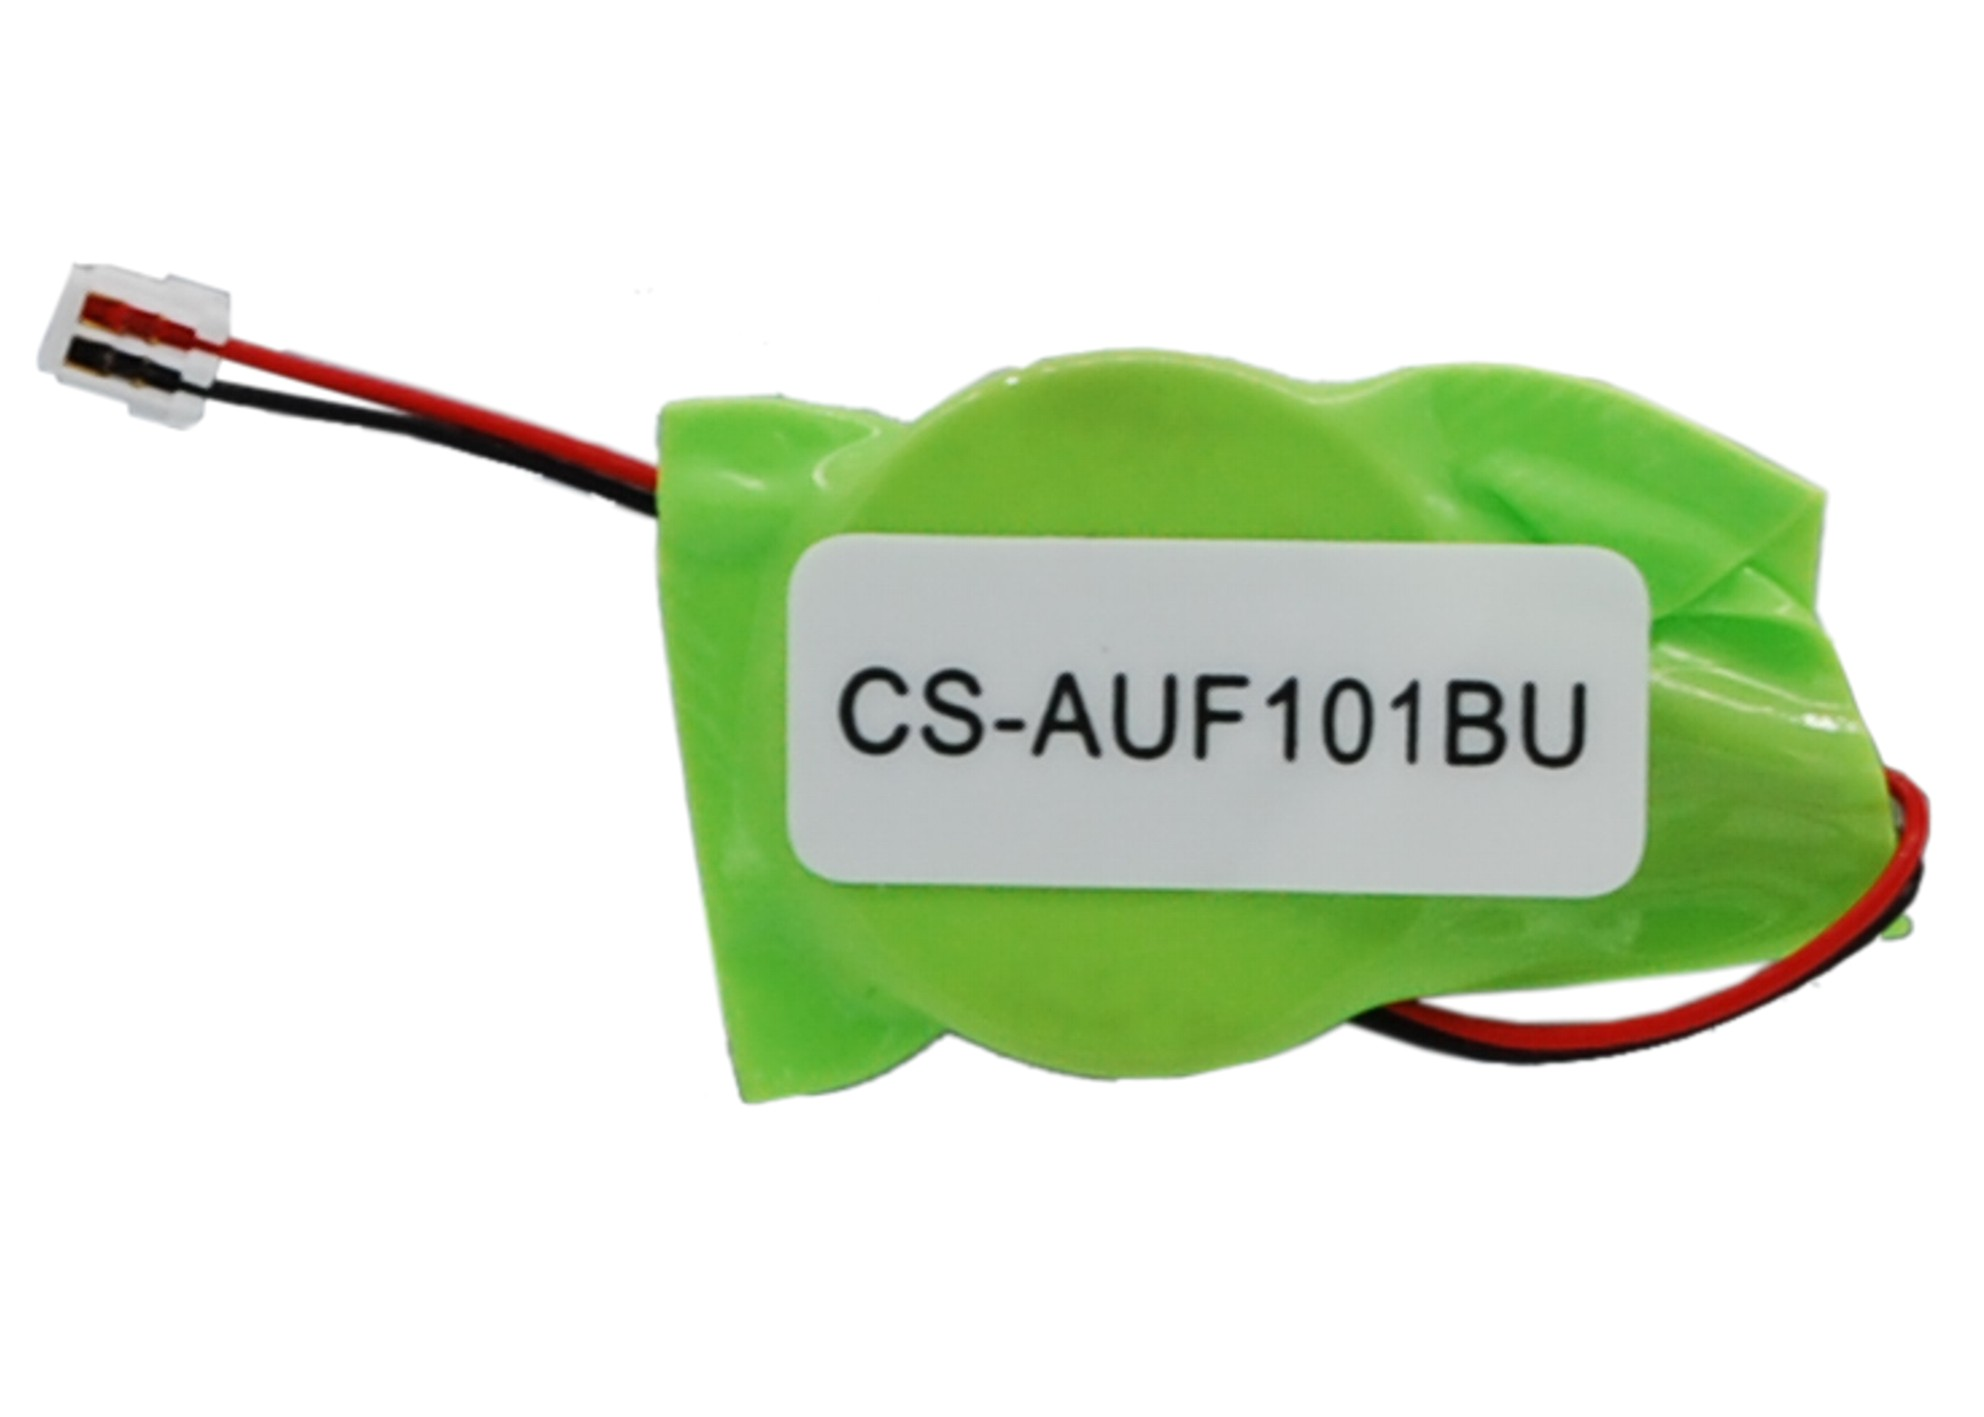 Cameron Sino baterie cmos pro ASUS Eee Pad Transformer TF101-1B090A 3V Li-ion 40mAh zelená - neoriginální